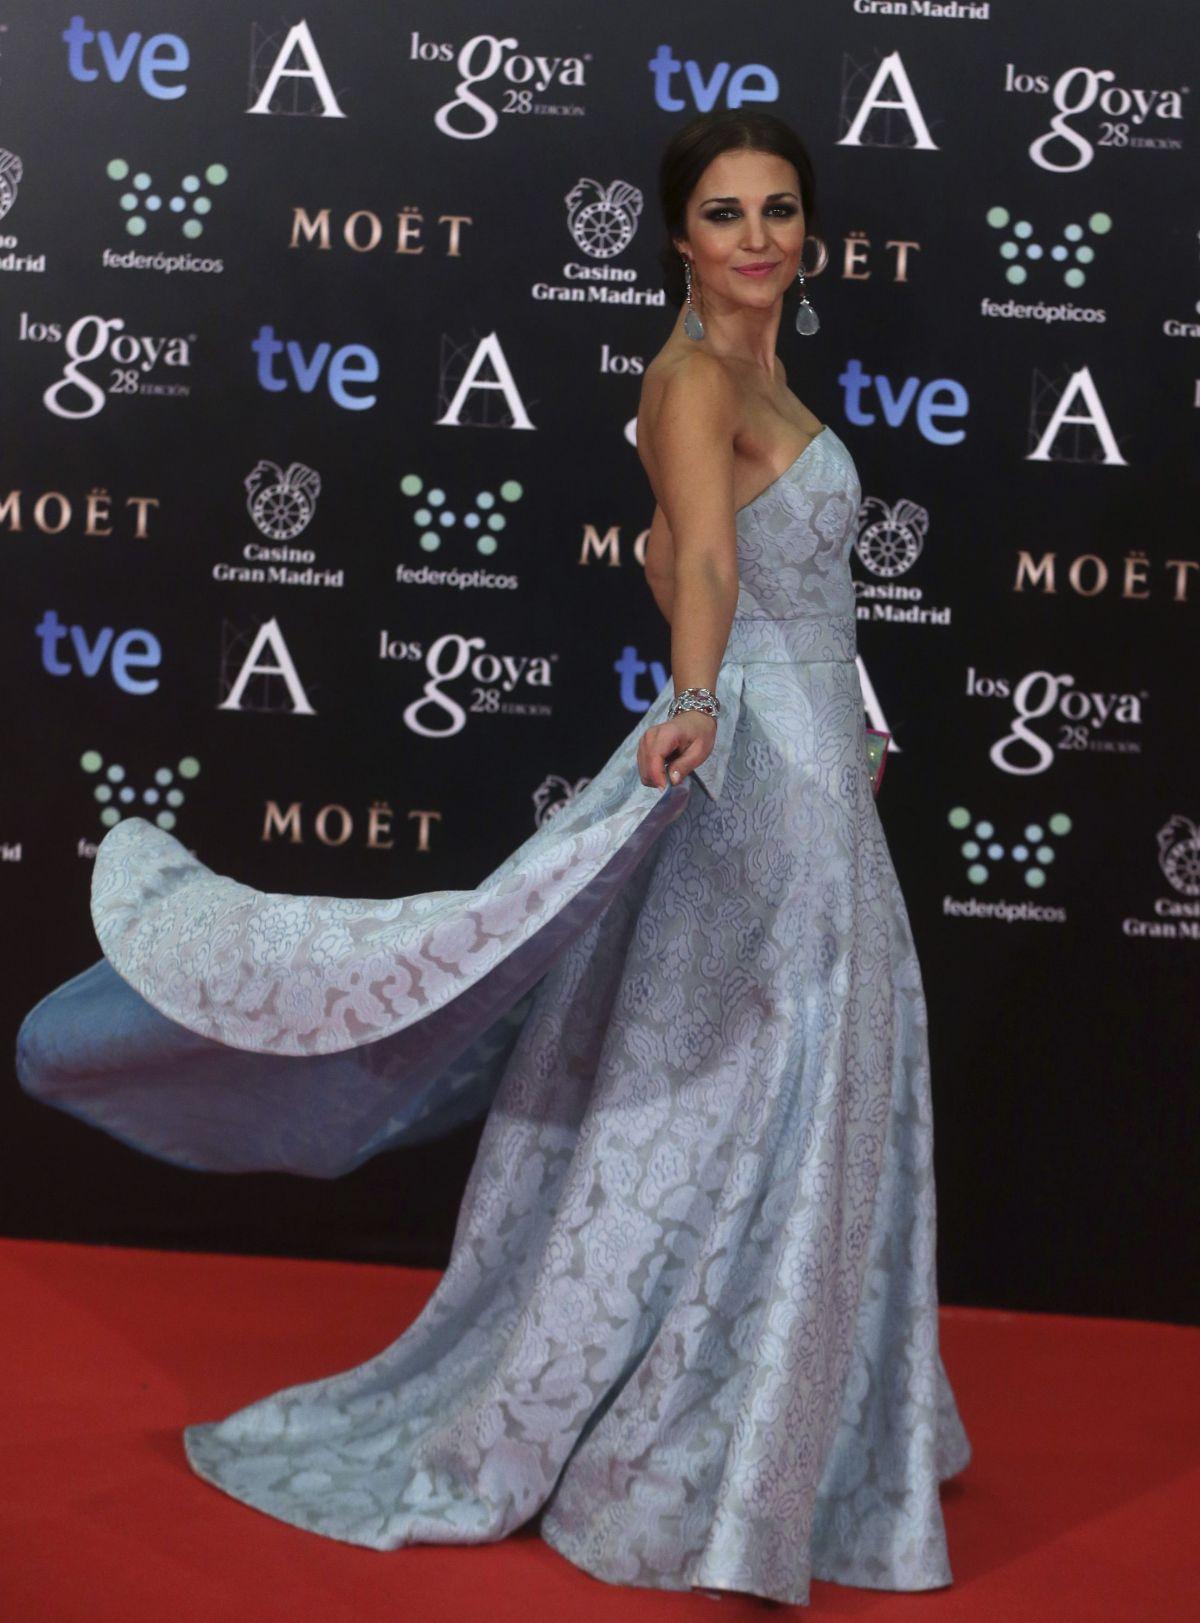 PAULA ECHEVARRIA at 2014 Goya Film Awards in Madrid